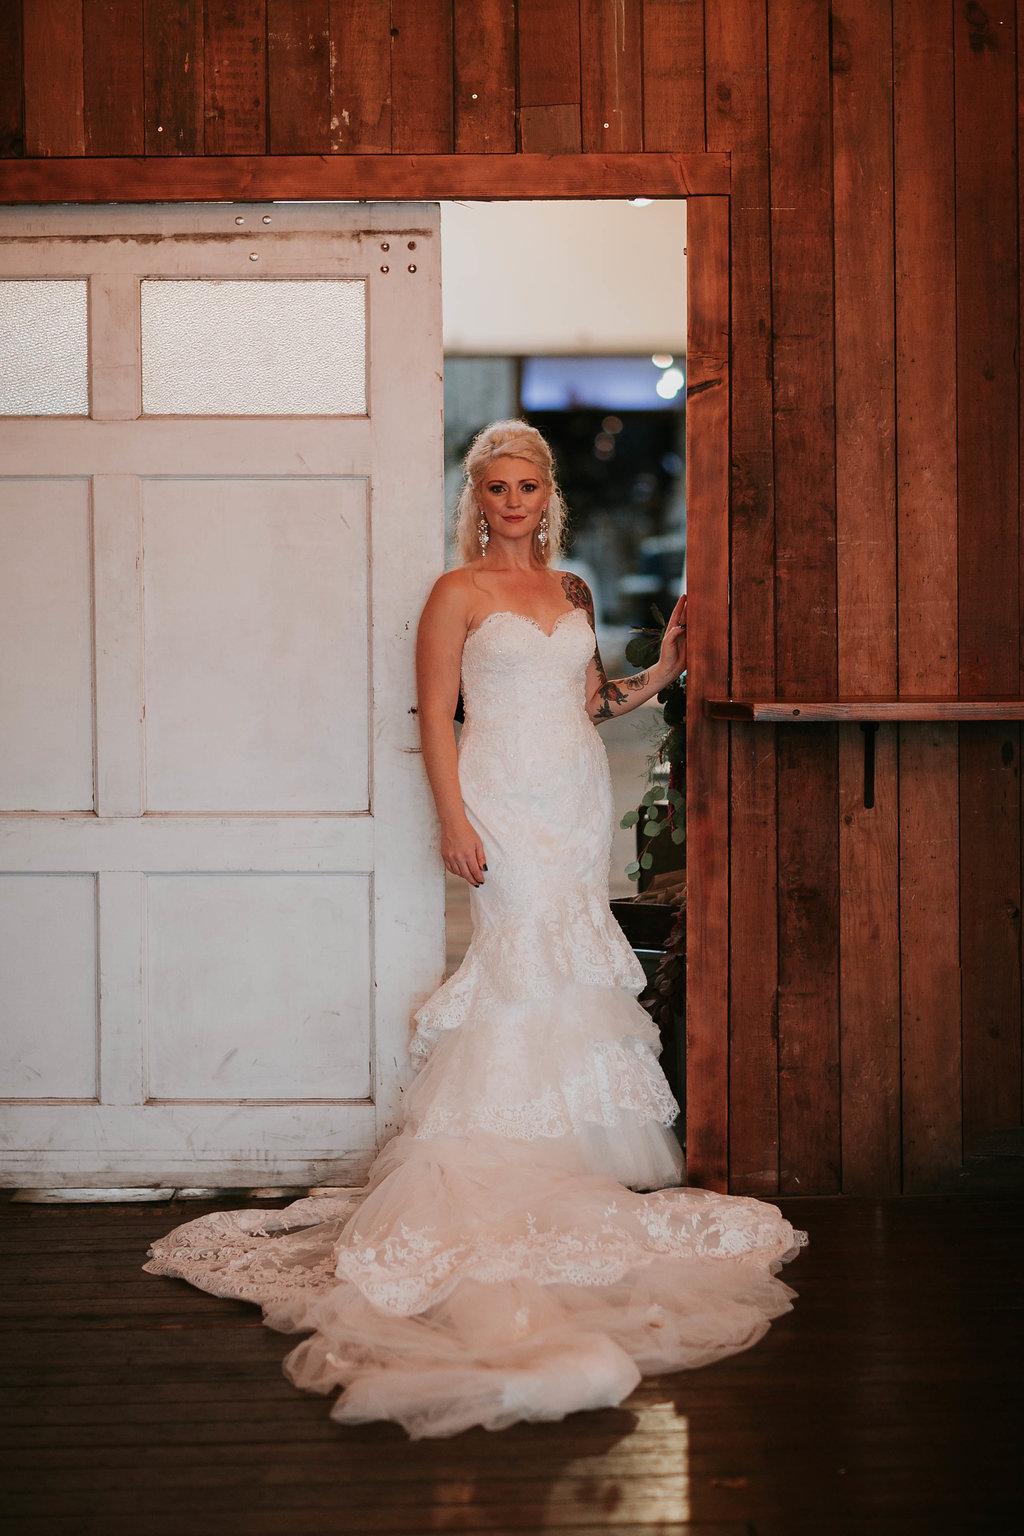 The_Big_Fake_wedding_Seattle_Within_sodo_wedding_by_Adina_Preston_Weddings_128.JPG